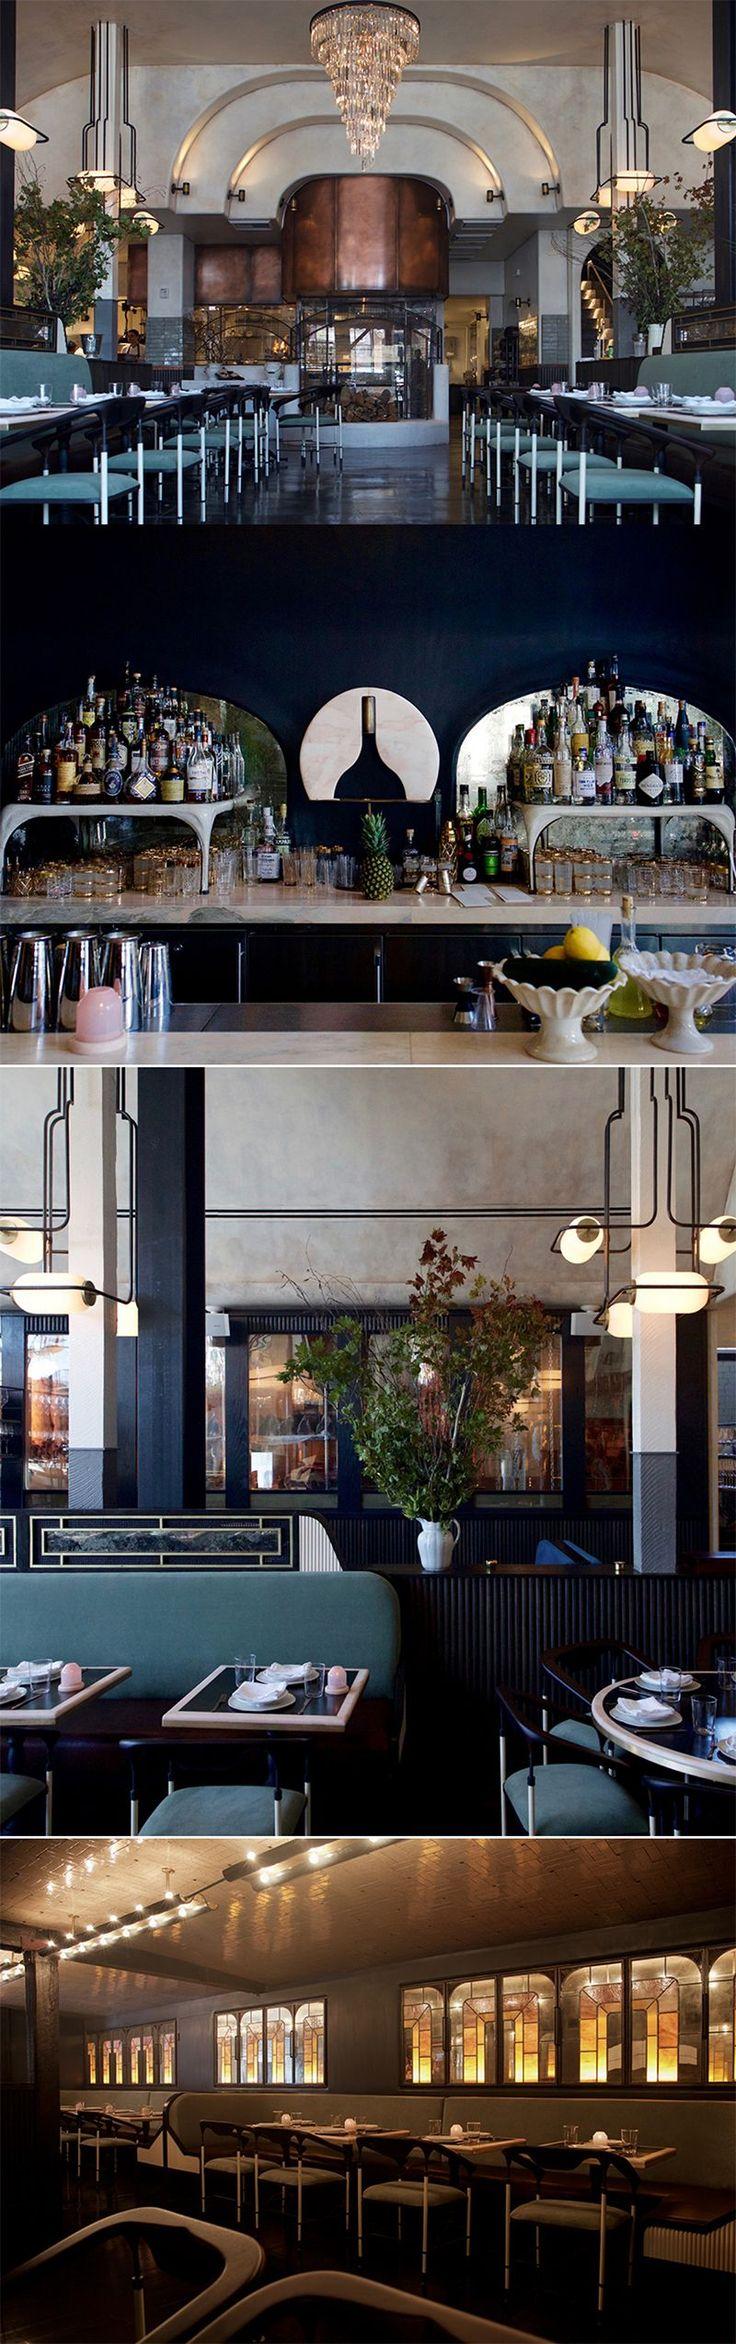 Best 25+ Cool restaurant ideas on Pinterest | Cool logos design ...